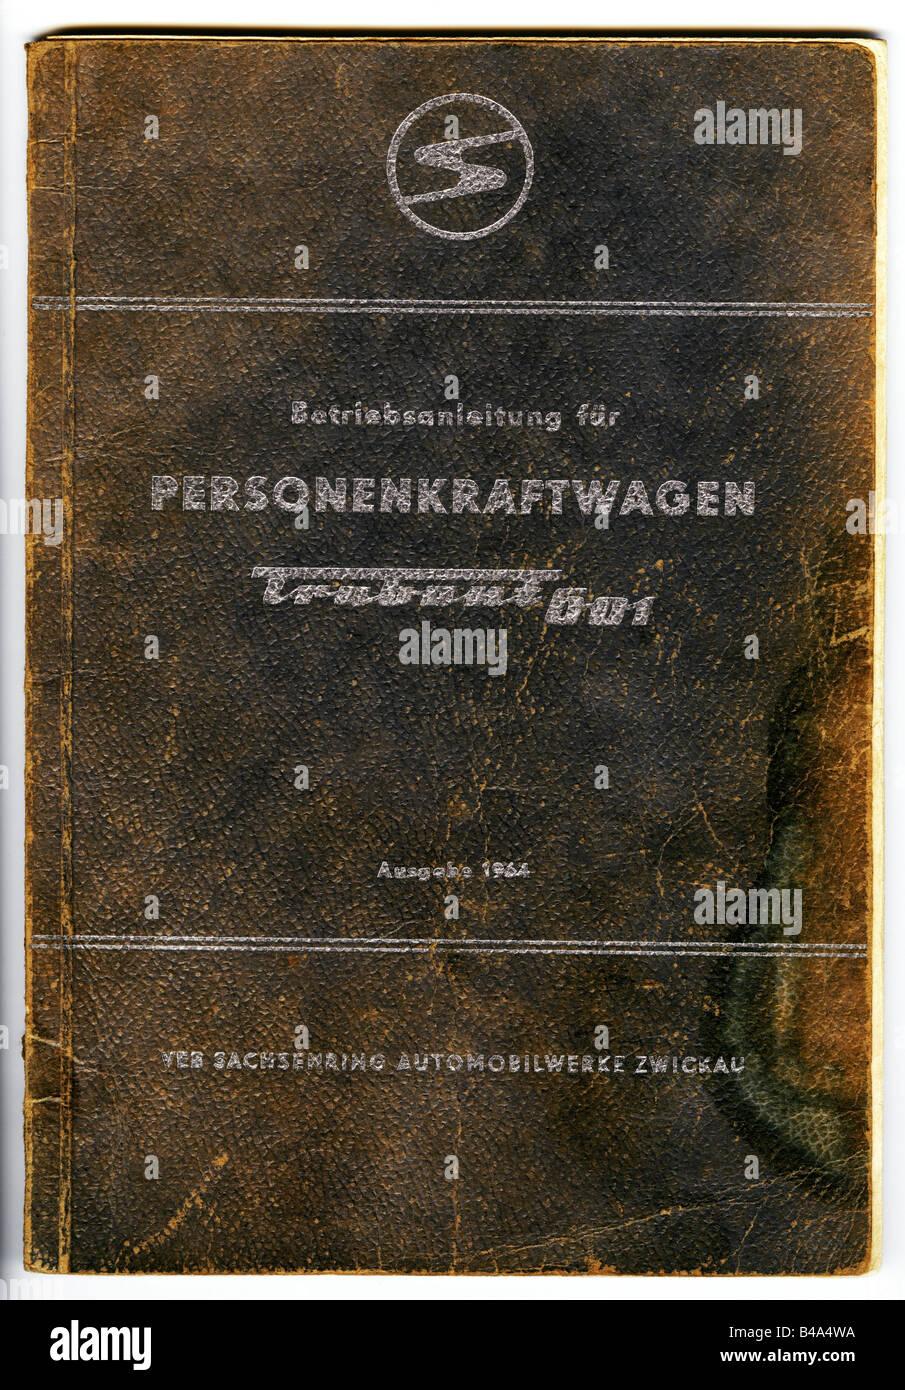 Manuale di istruzioni per automobili Trabant 601 di VEB Sachsenring Automobilwerke Zwickau, VEB Fachbuchverlag Leipzig, Immagini Stock